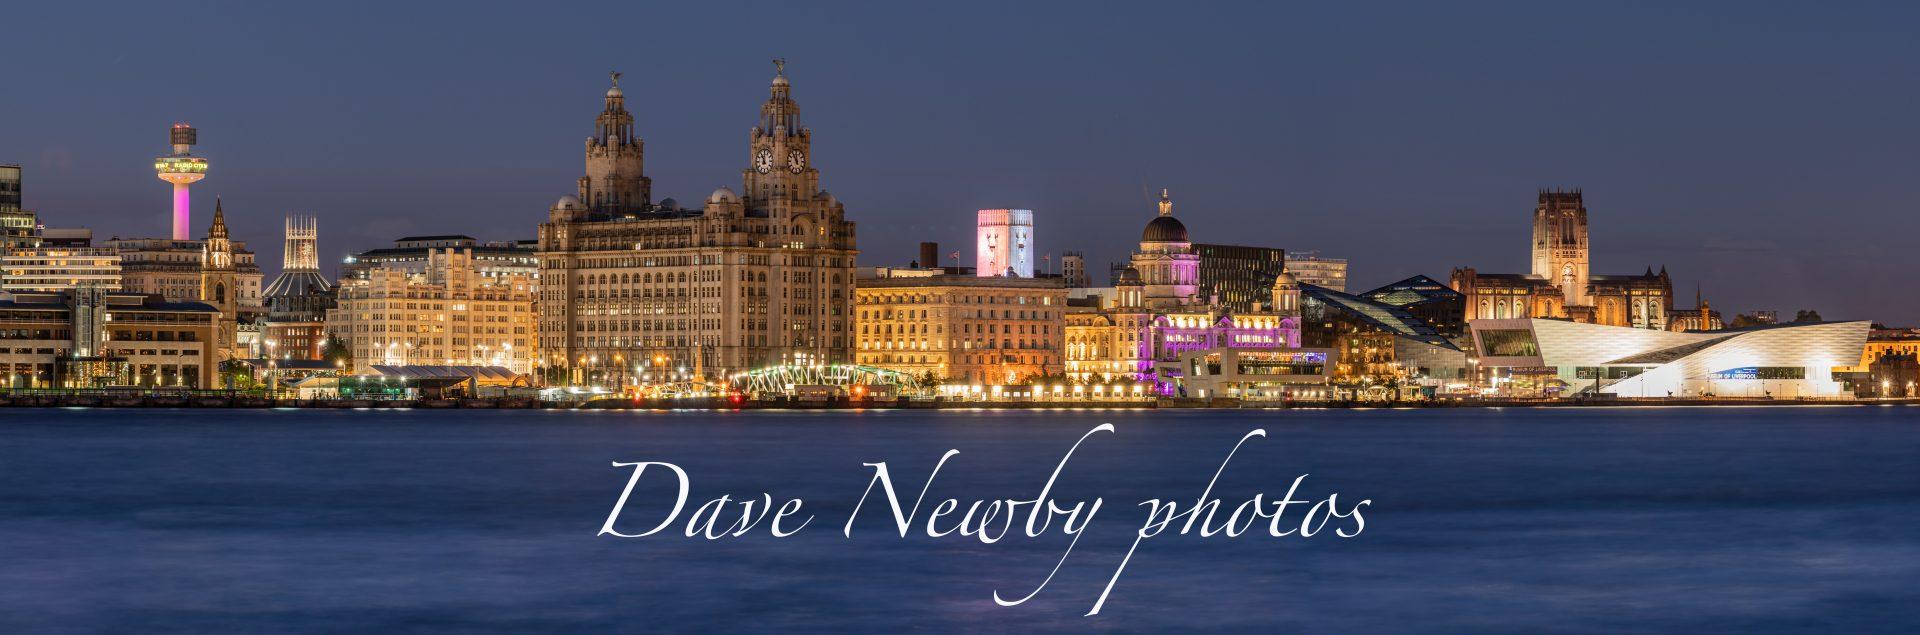 Dave Newby Photos